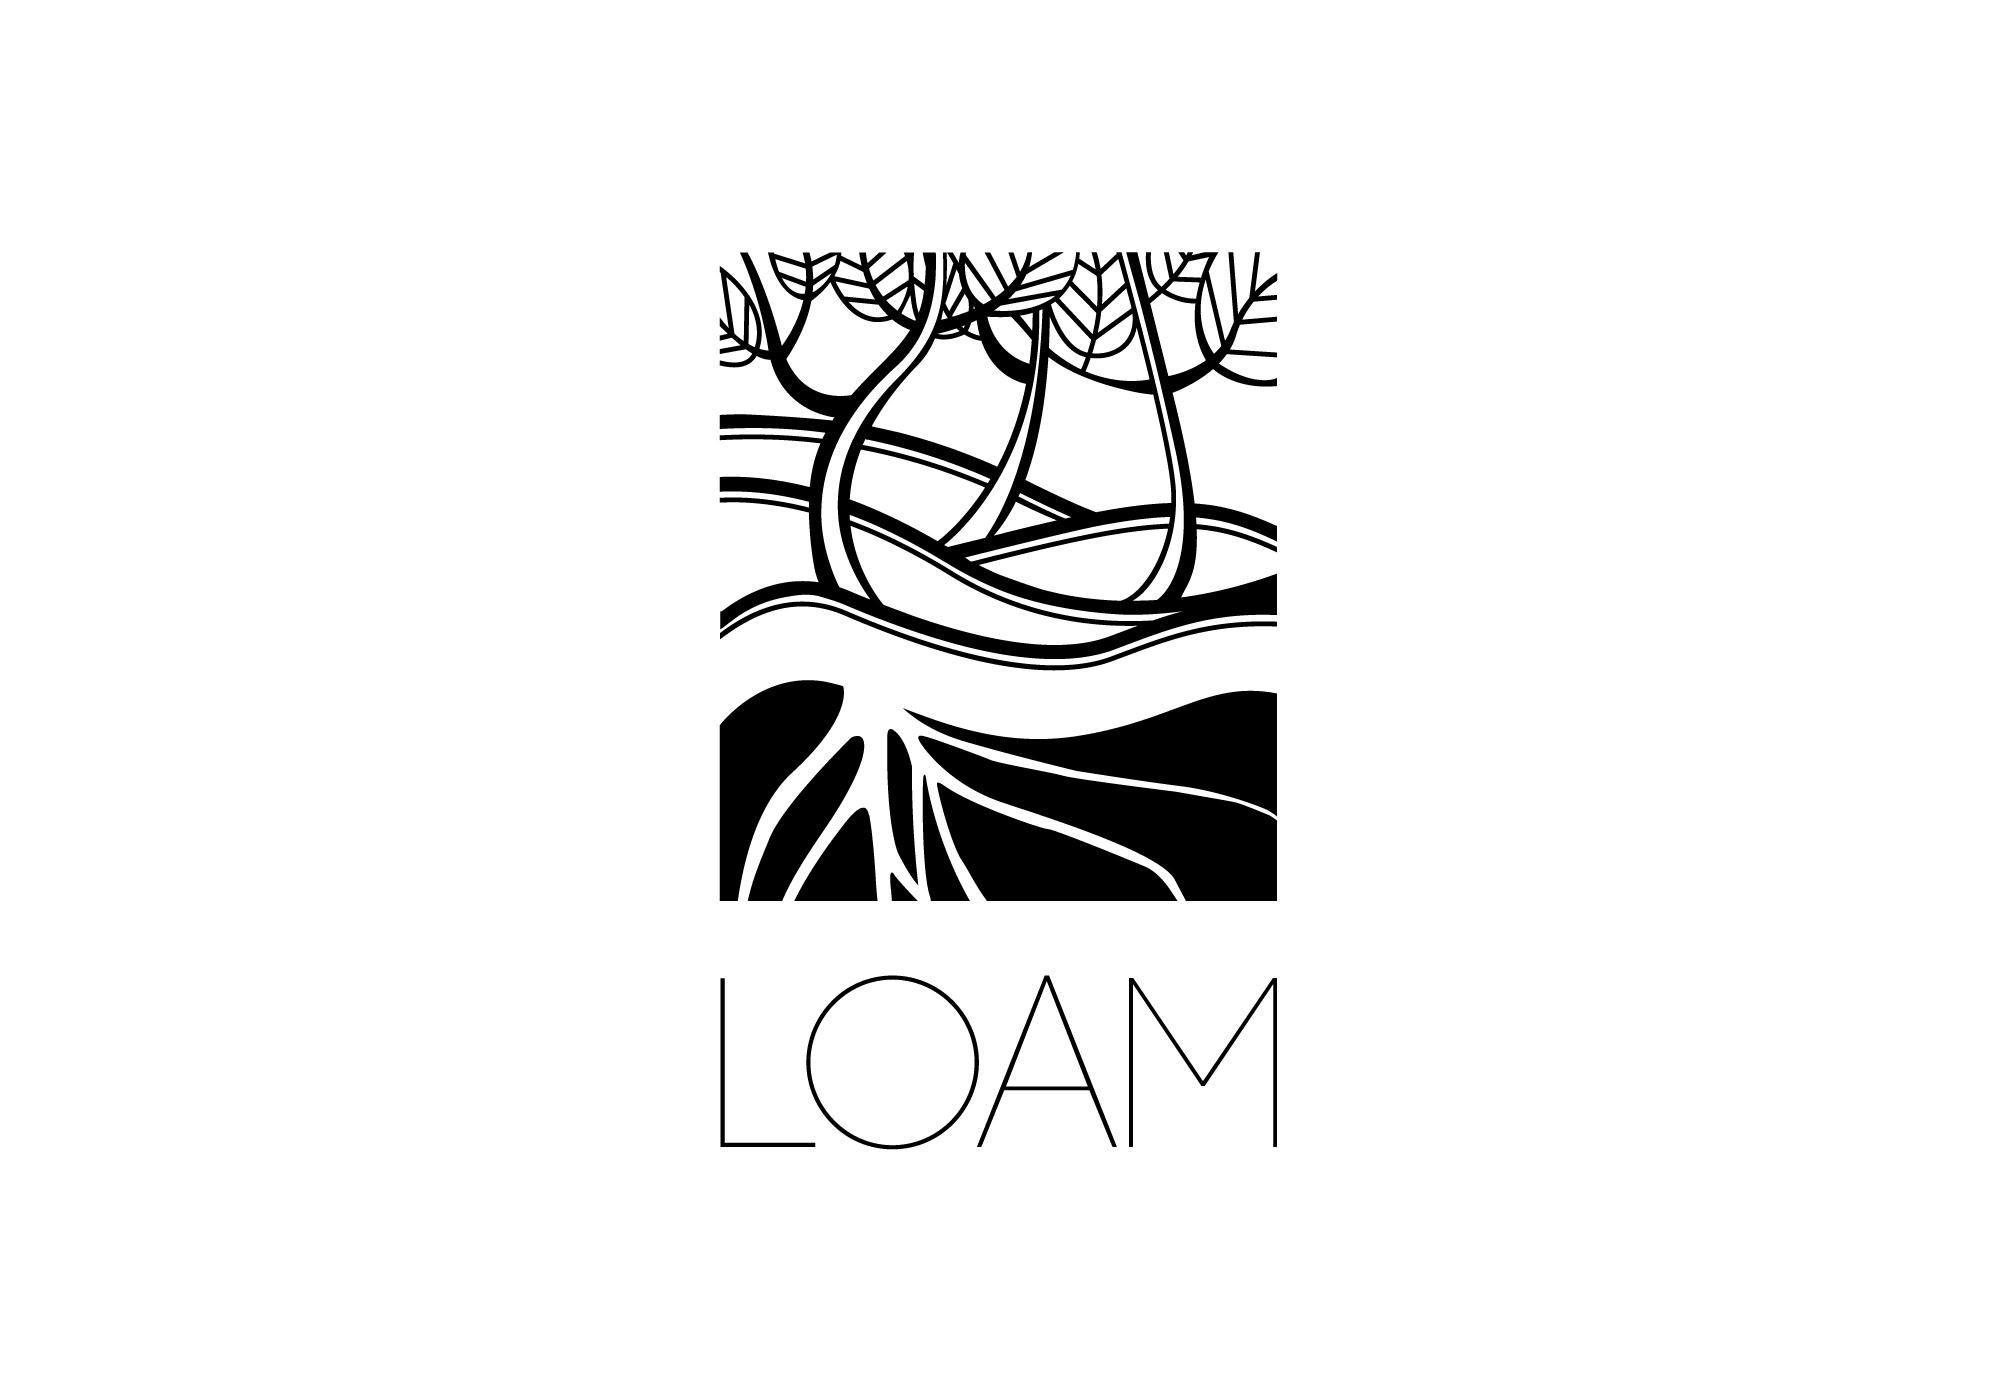 Cover image: Loam